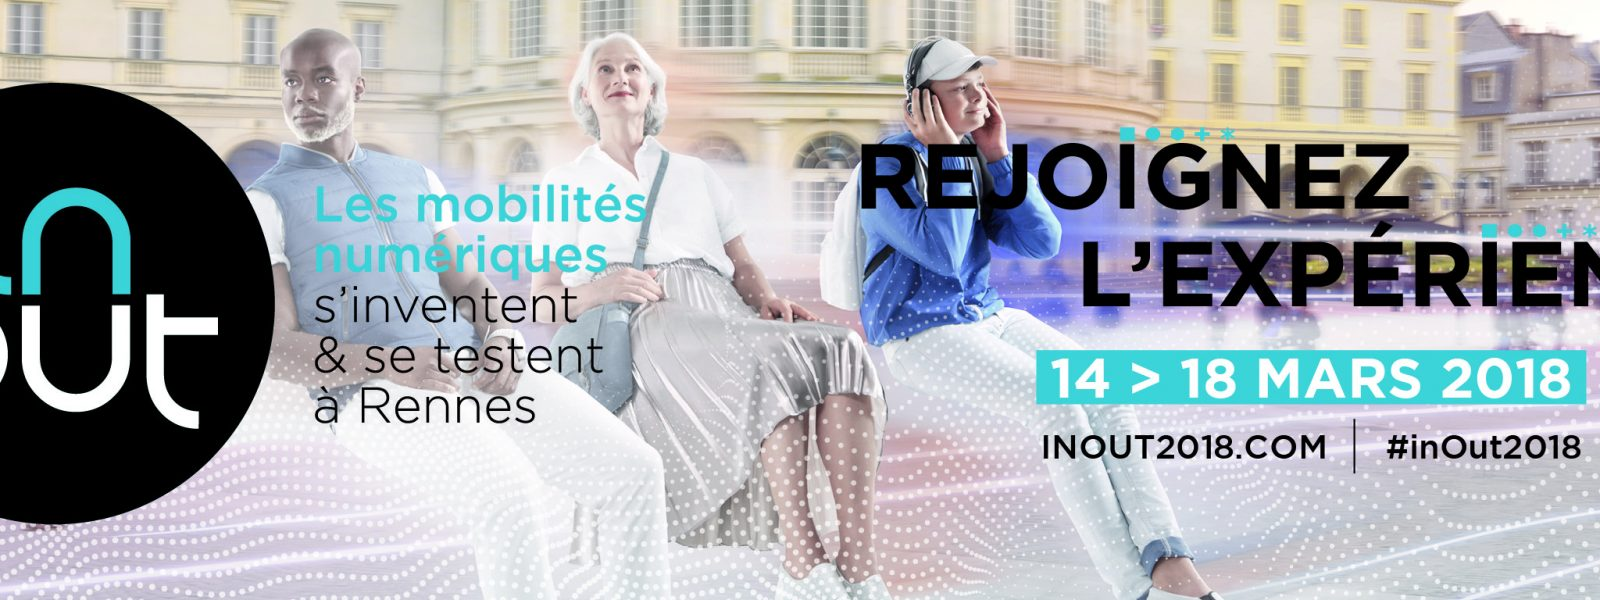 Inout 2018 - Rennes